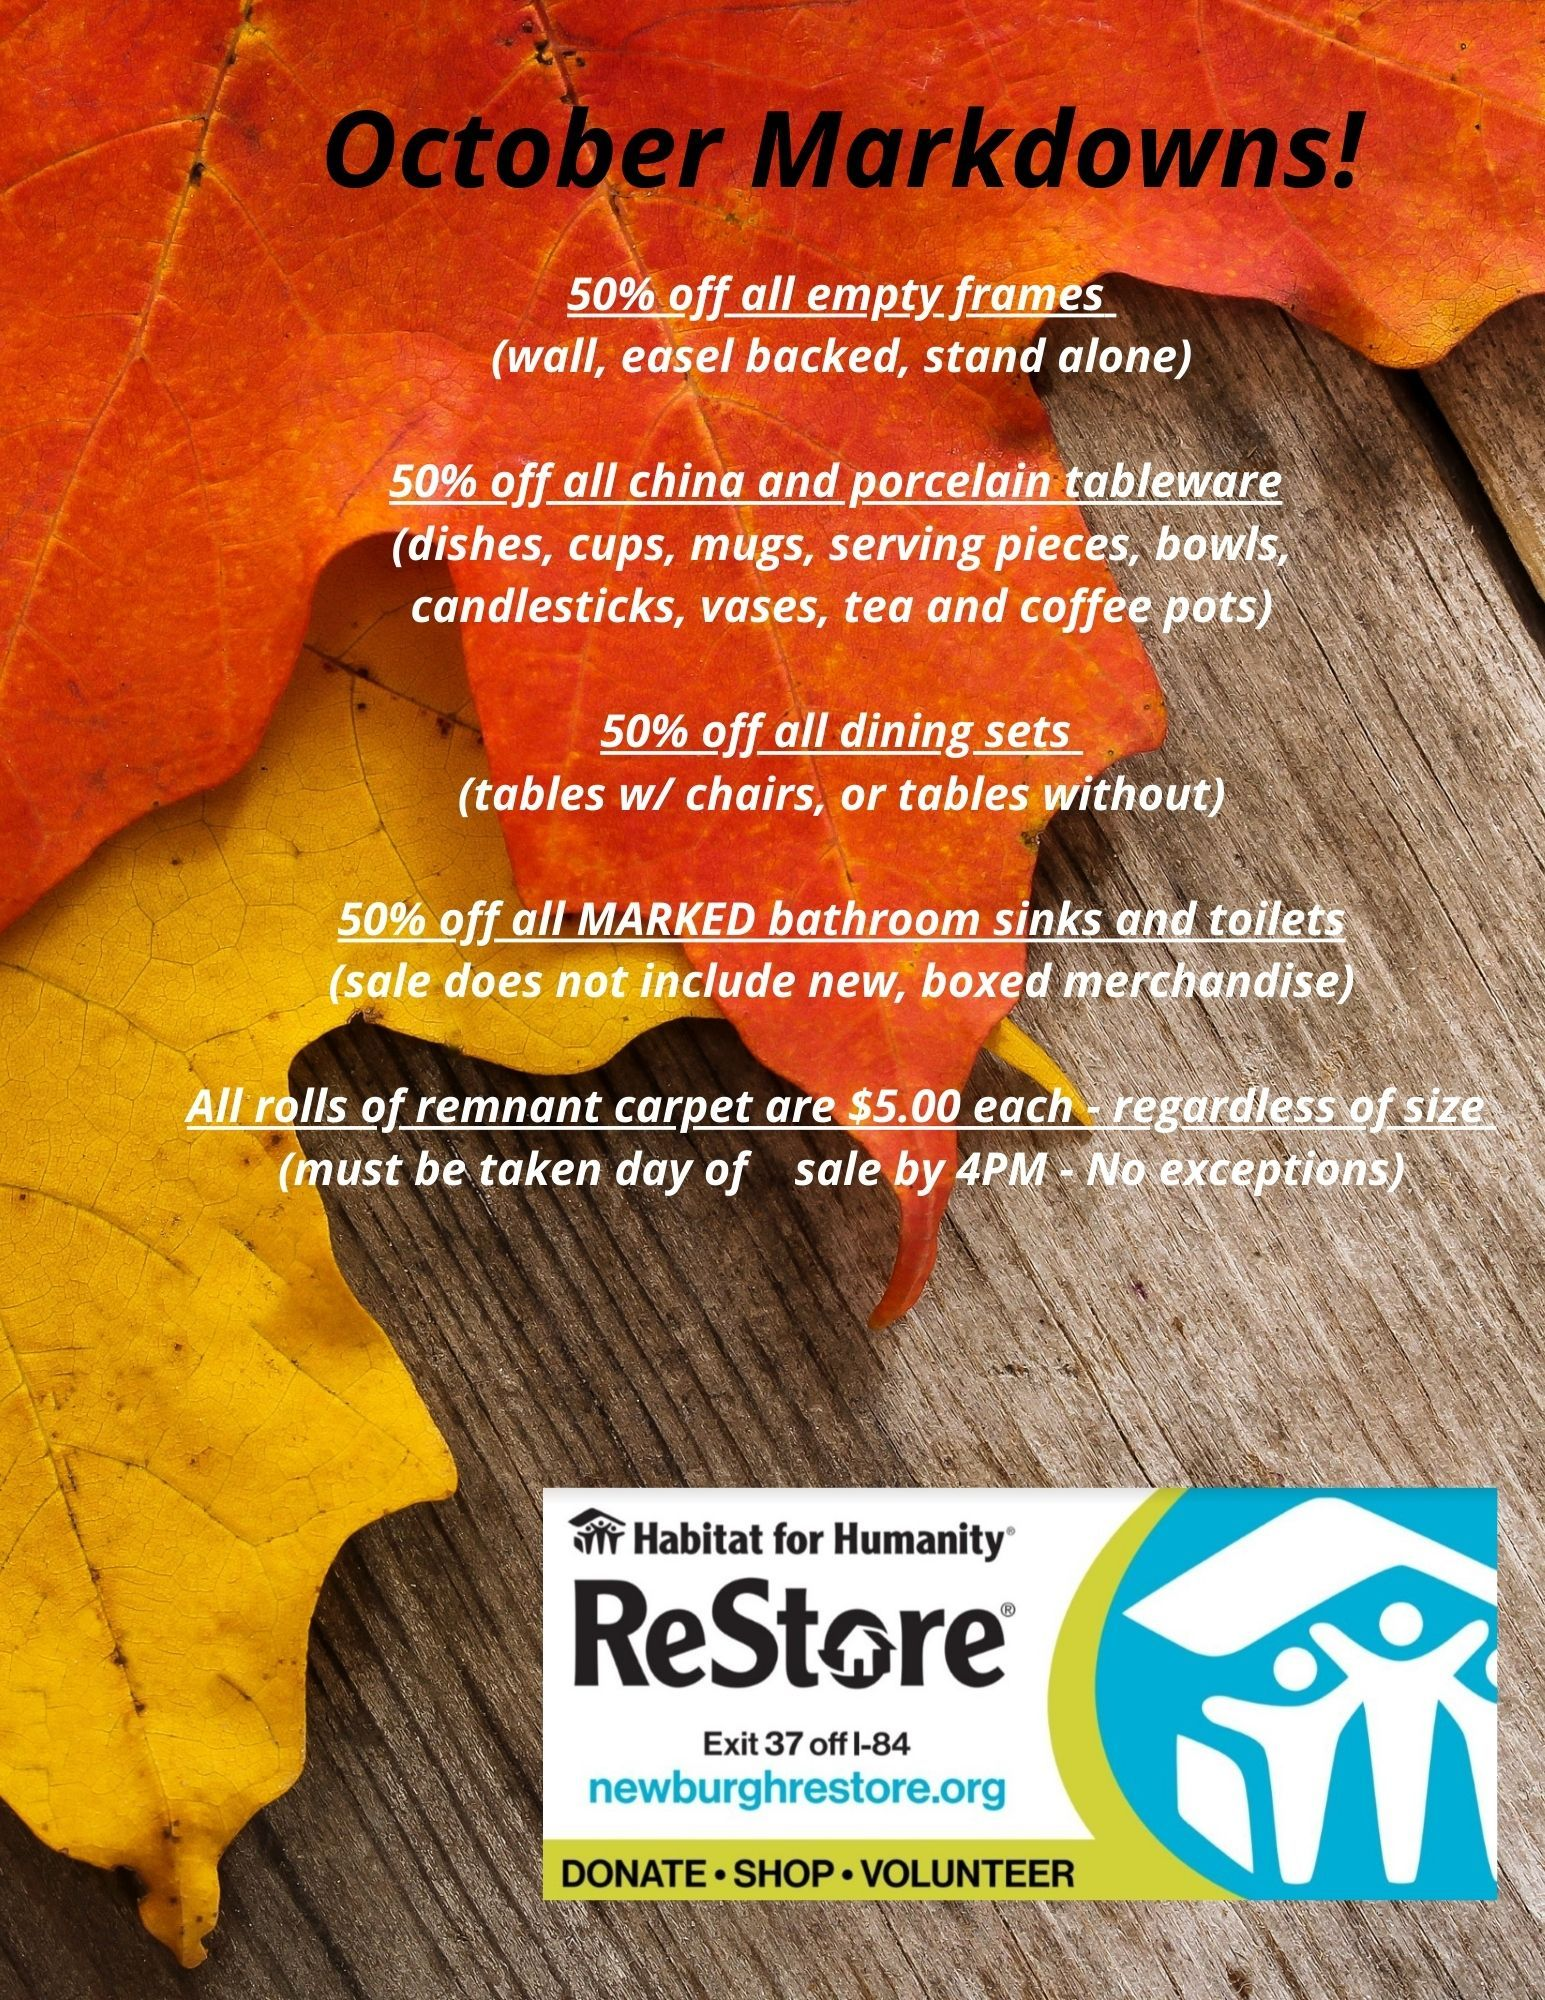 October Markdown Sale at ReStore!